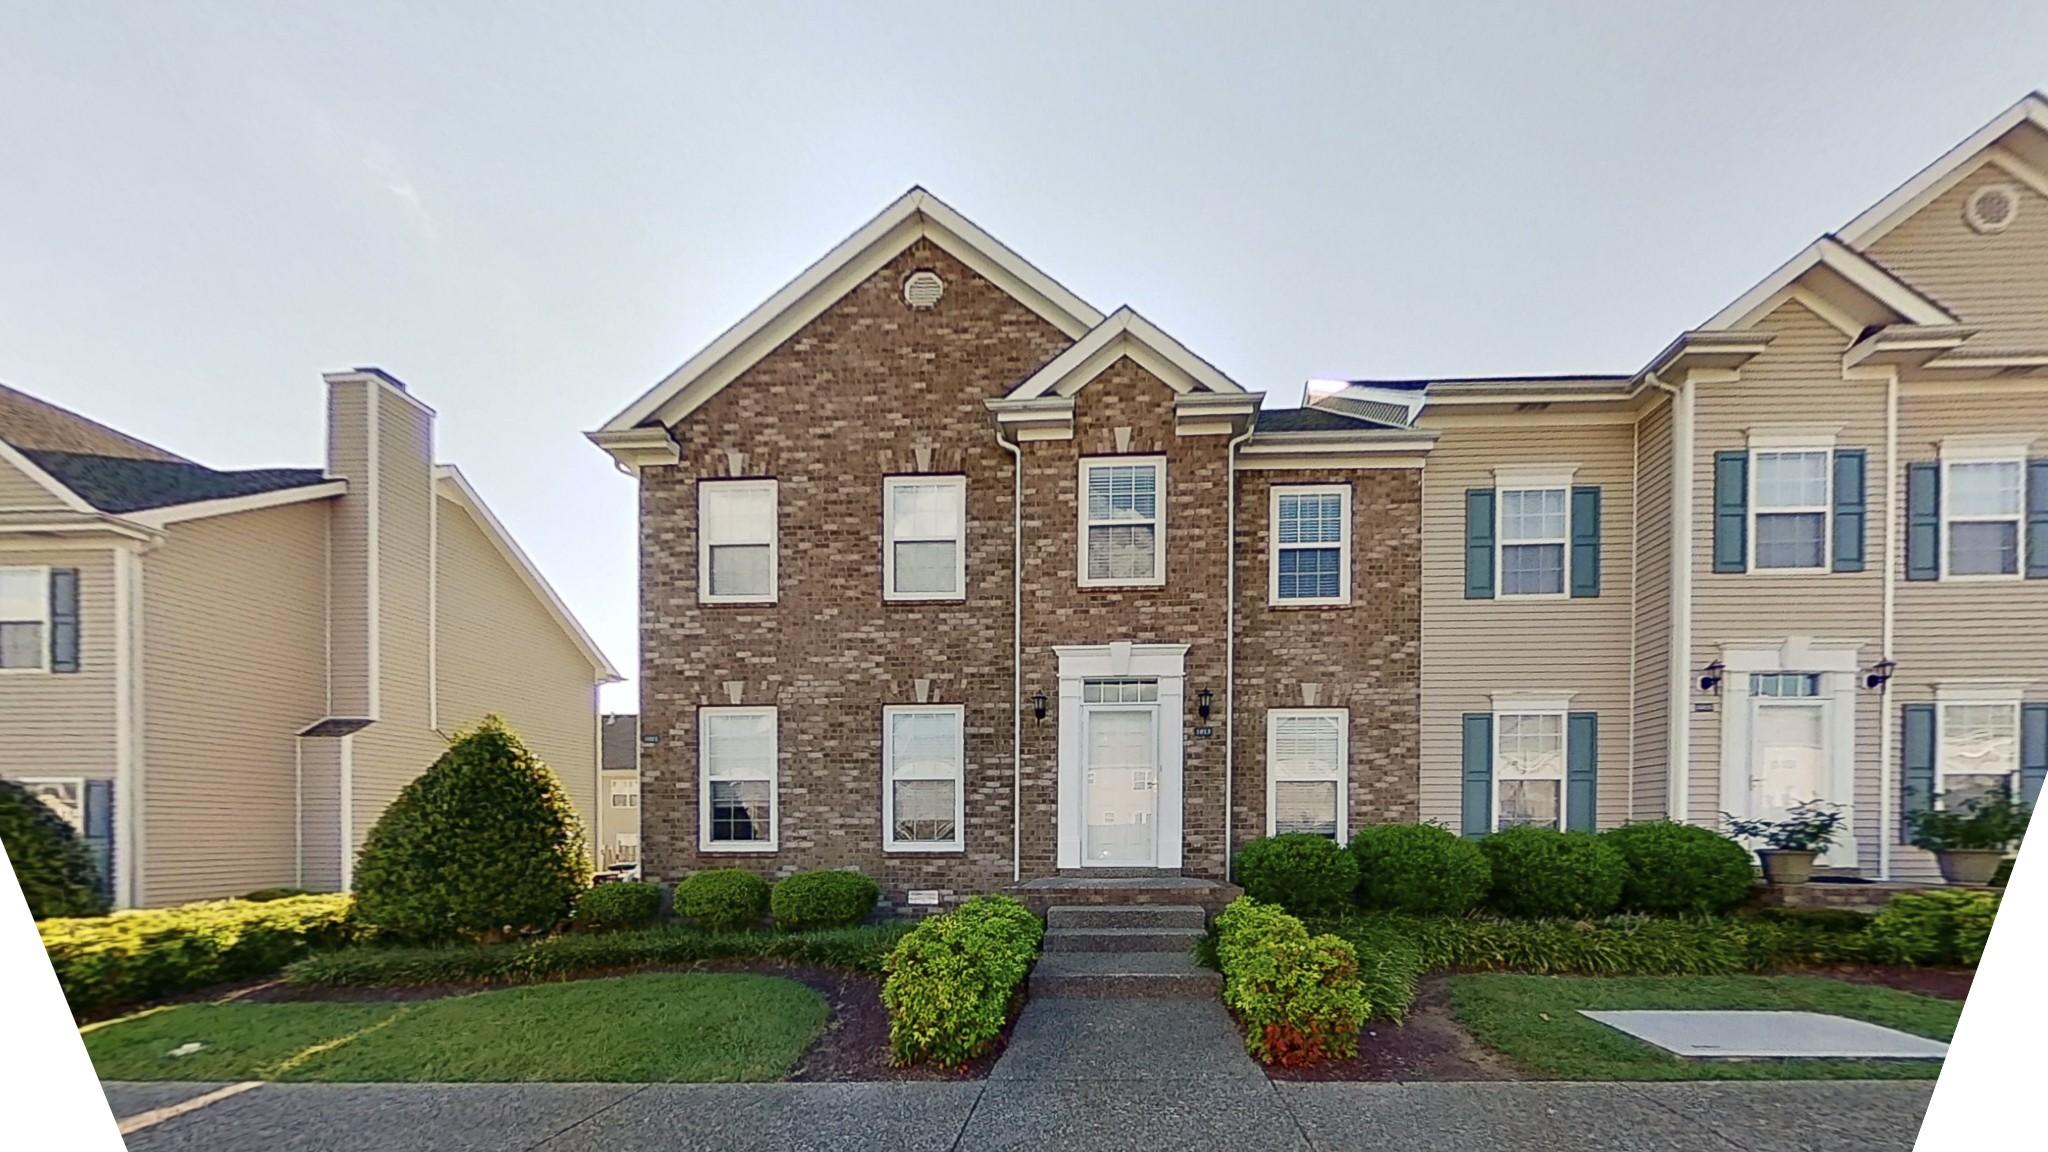 1013 McKenna Dr #O2 Property Photo - Thompsons Station, TN real estate listing